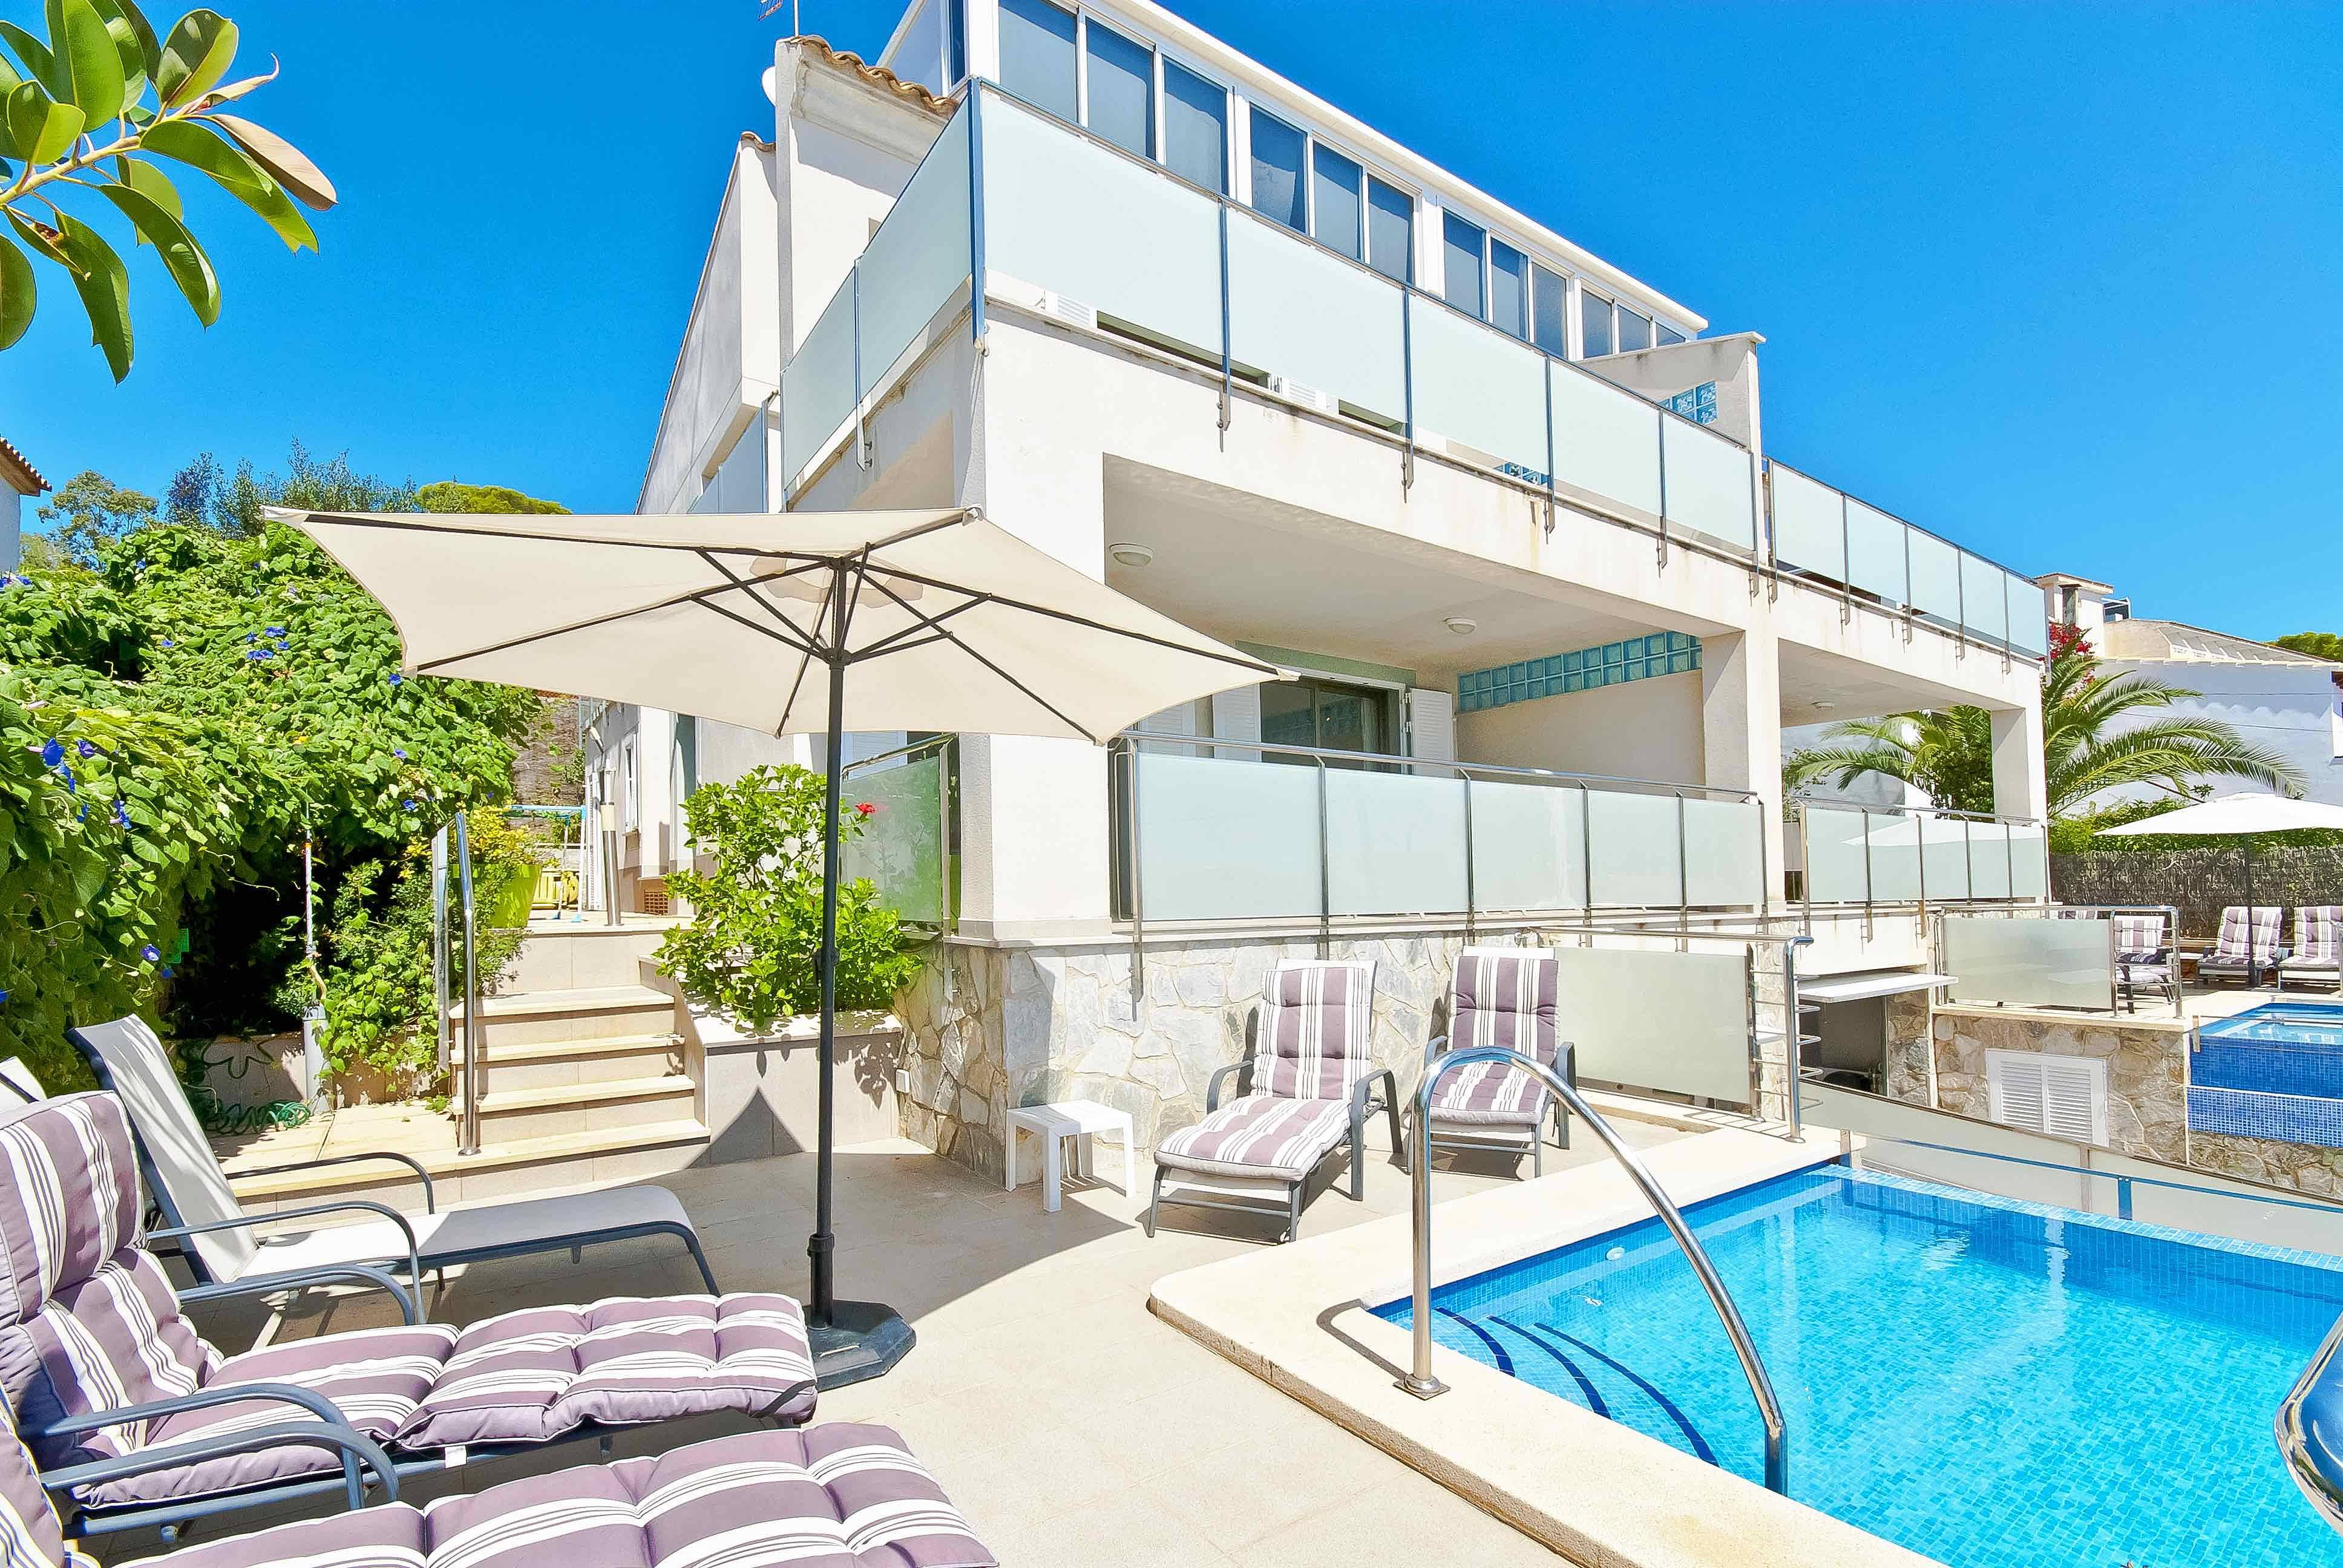 Gran casa con piscina junto al mar port d 39 alcudia for Hoteles junto al mar